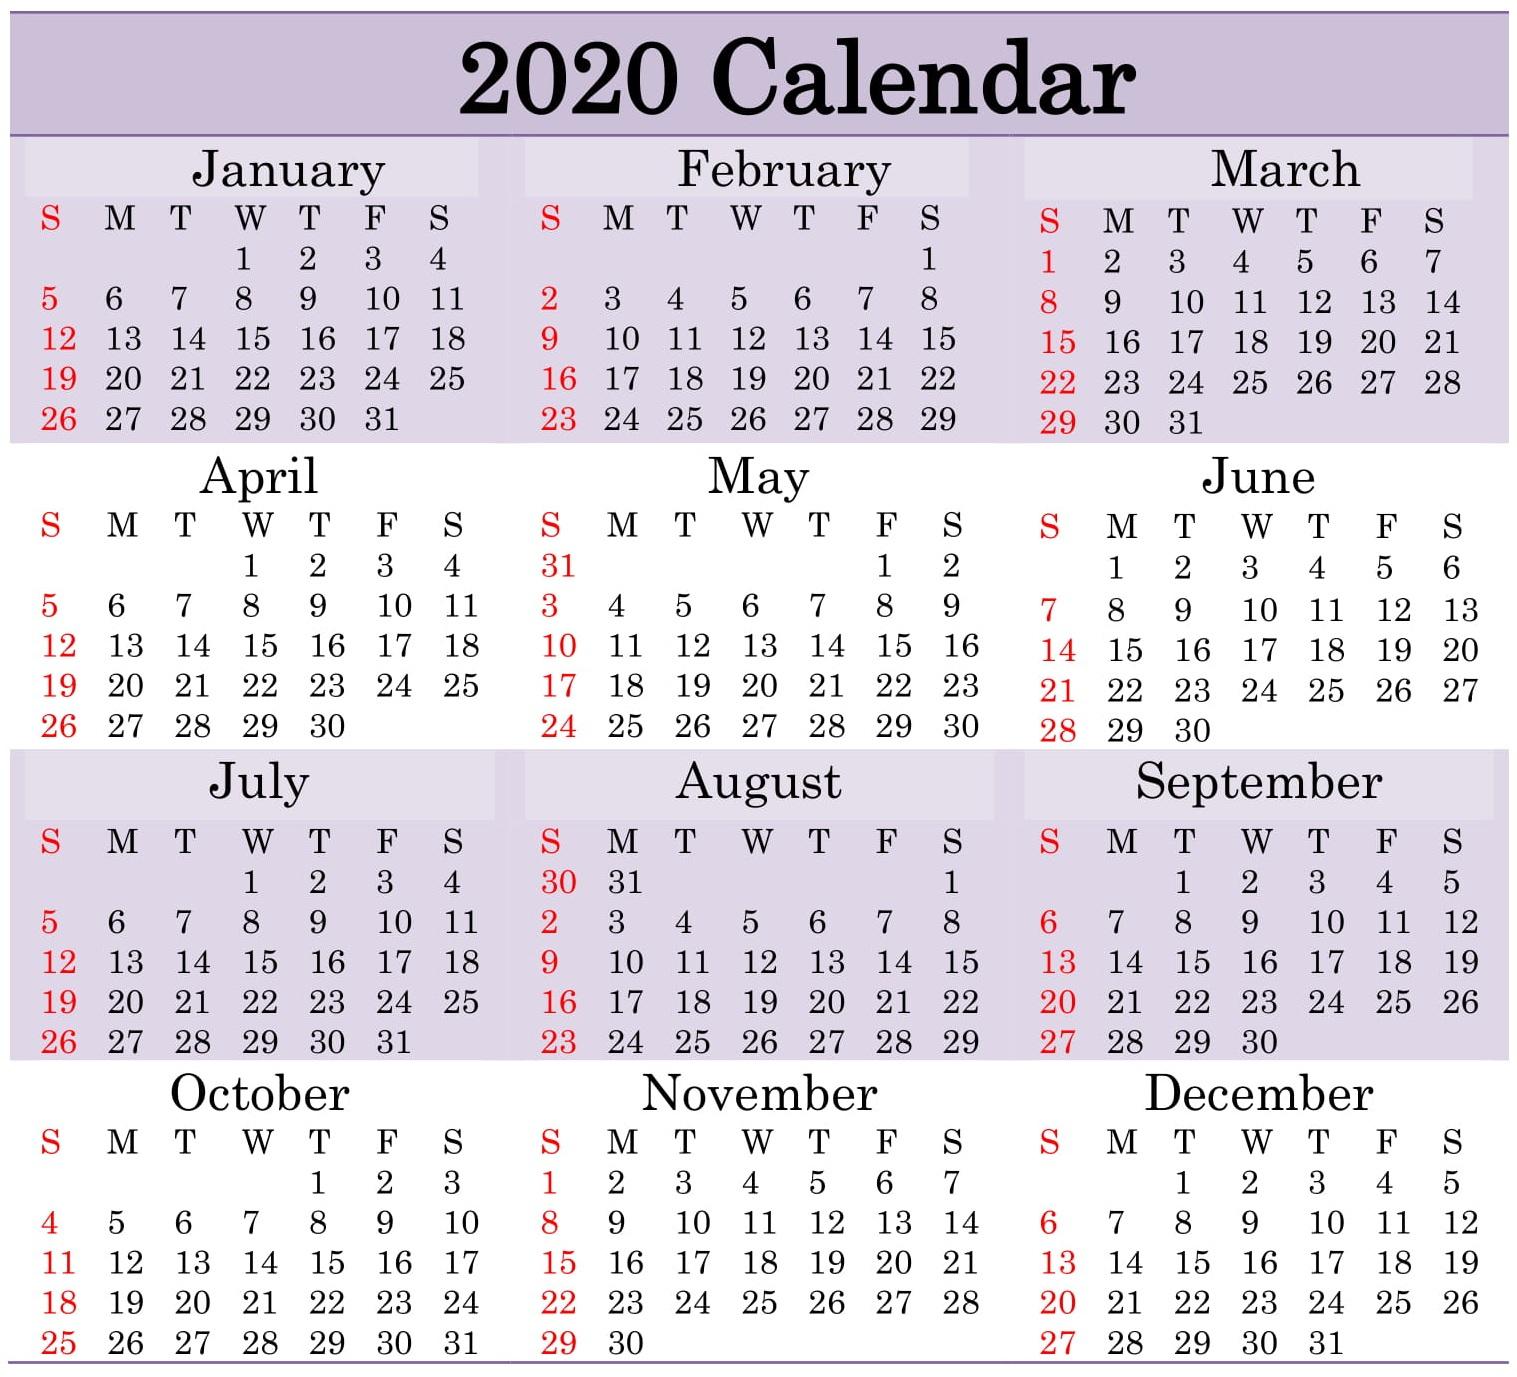 Printable 2020 Calendar Word Document  Latest Printable for Julian Calendar Leap Year